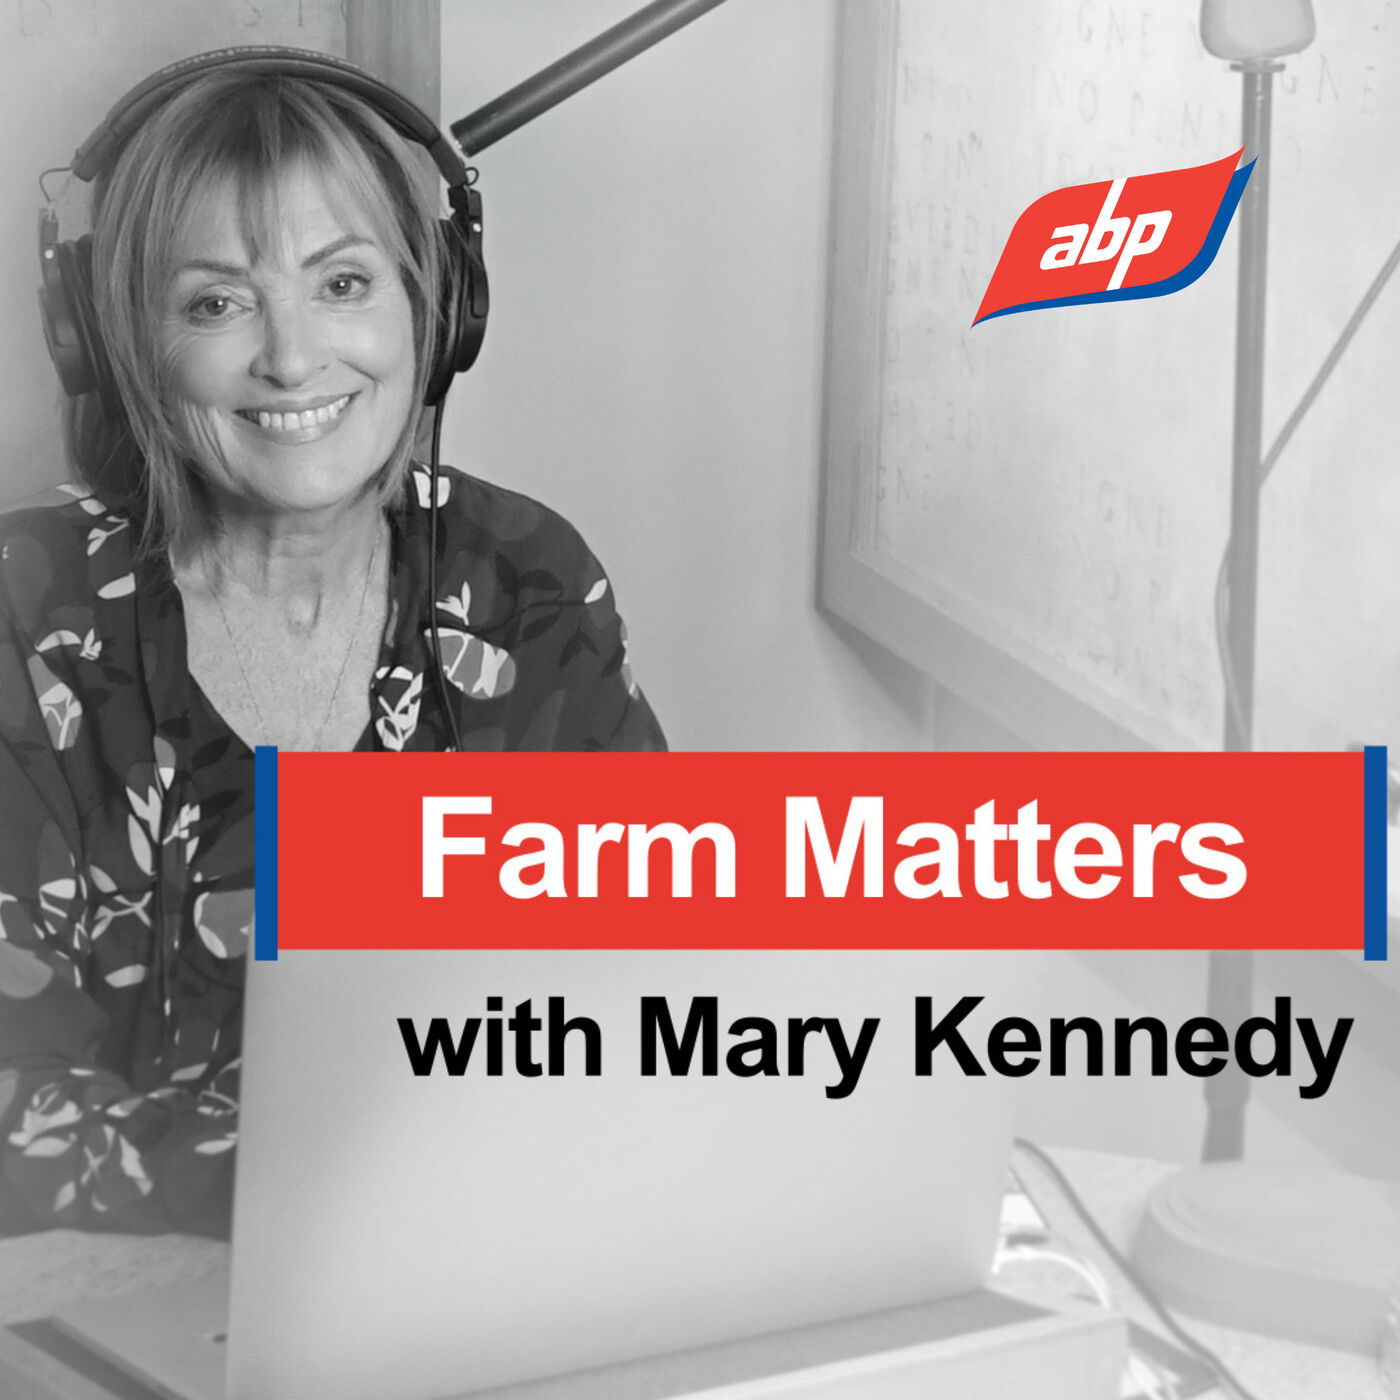 Farm Matters - Farm Safety